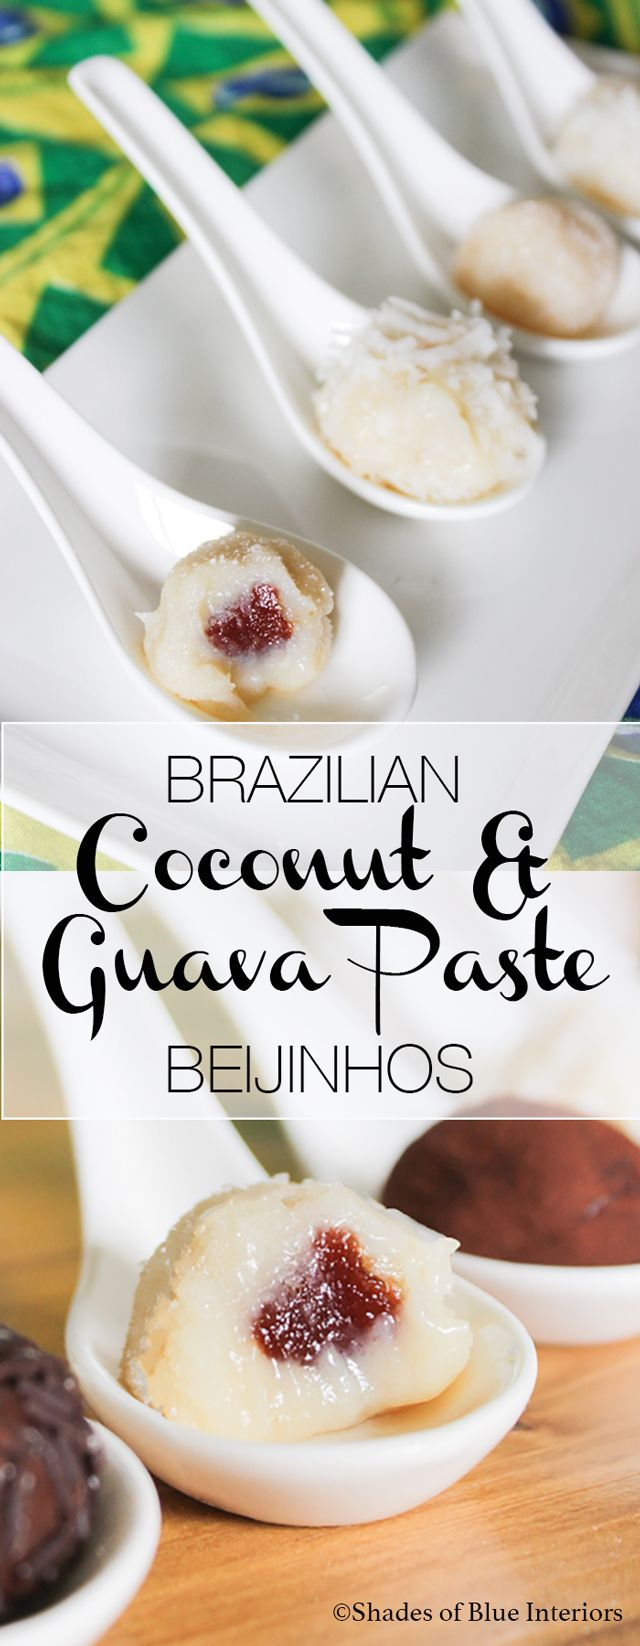 Brazilian Coconut and Guava Paste Beijinhos